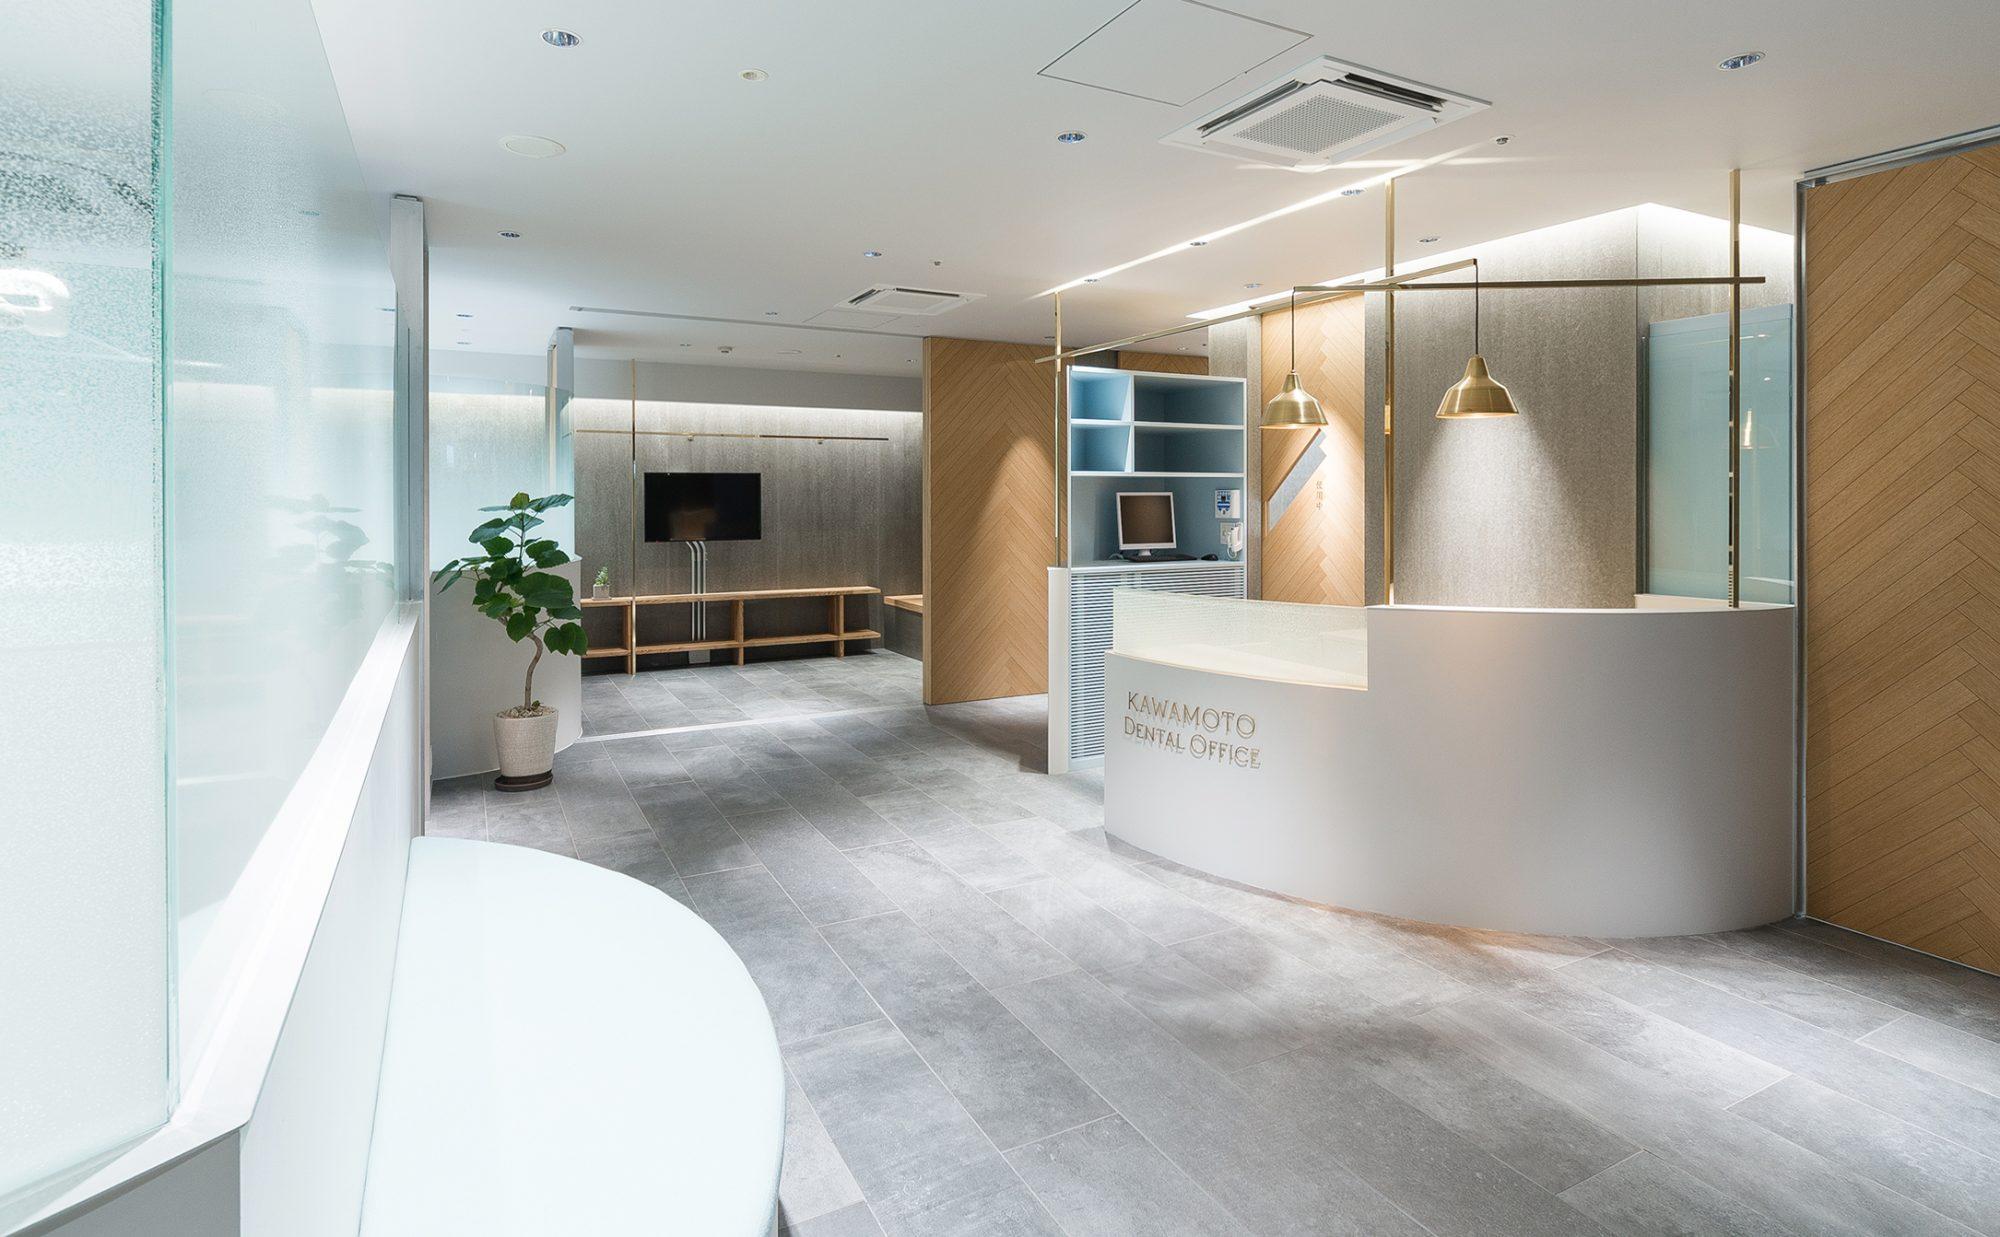 Kawamoto Dental Office